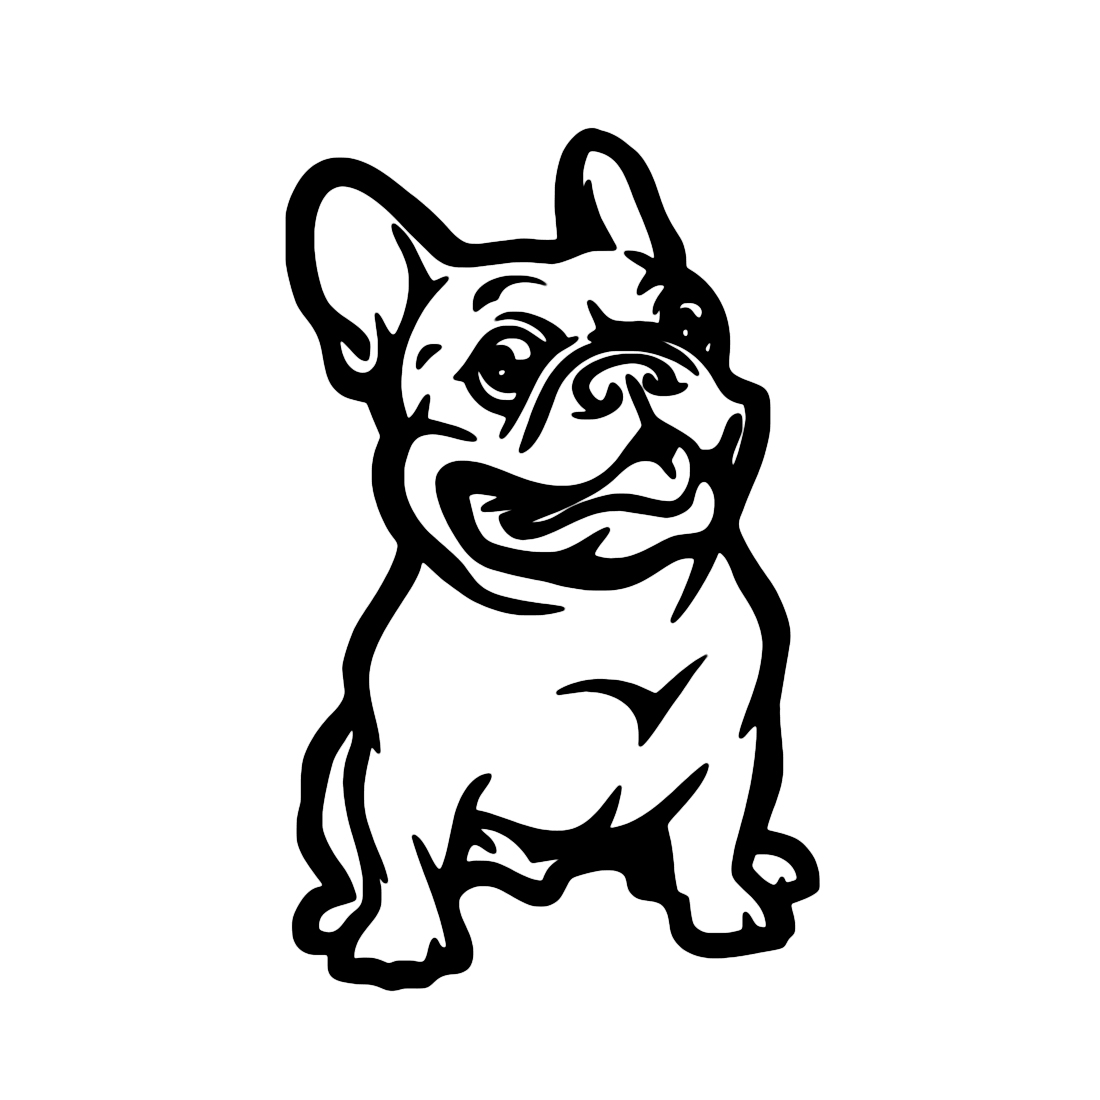 Dewtreetali French Bulldog Dog Car Sticker PET Cars Decal Weatherproof Auto Styling Cartoon Car Stickers Car Accessories